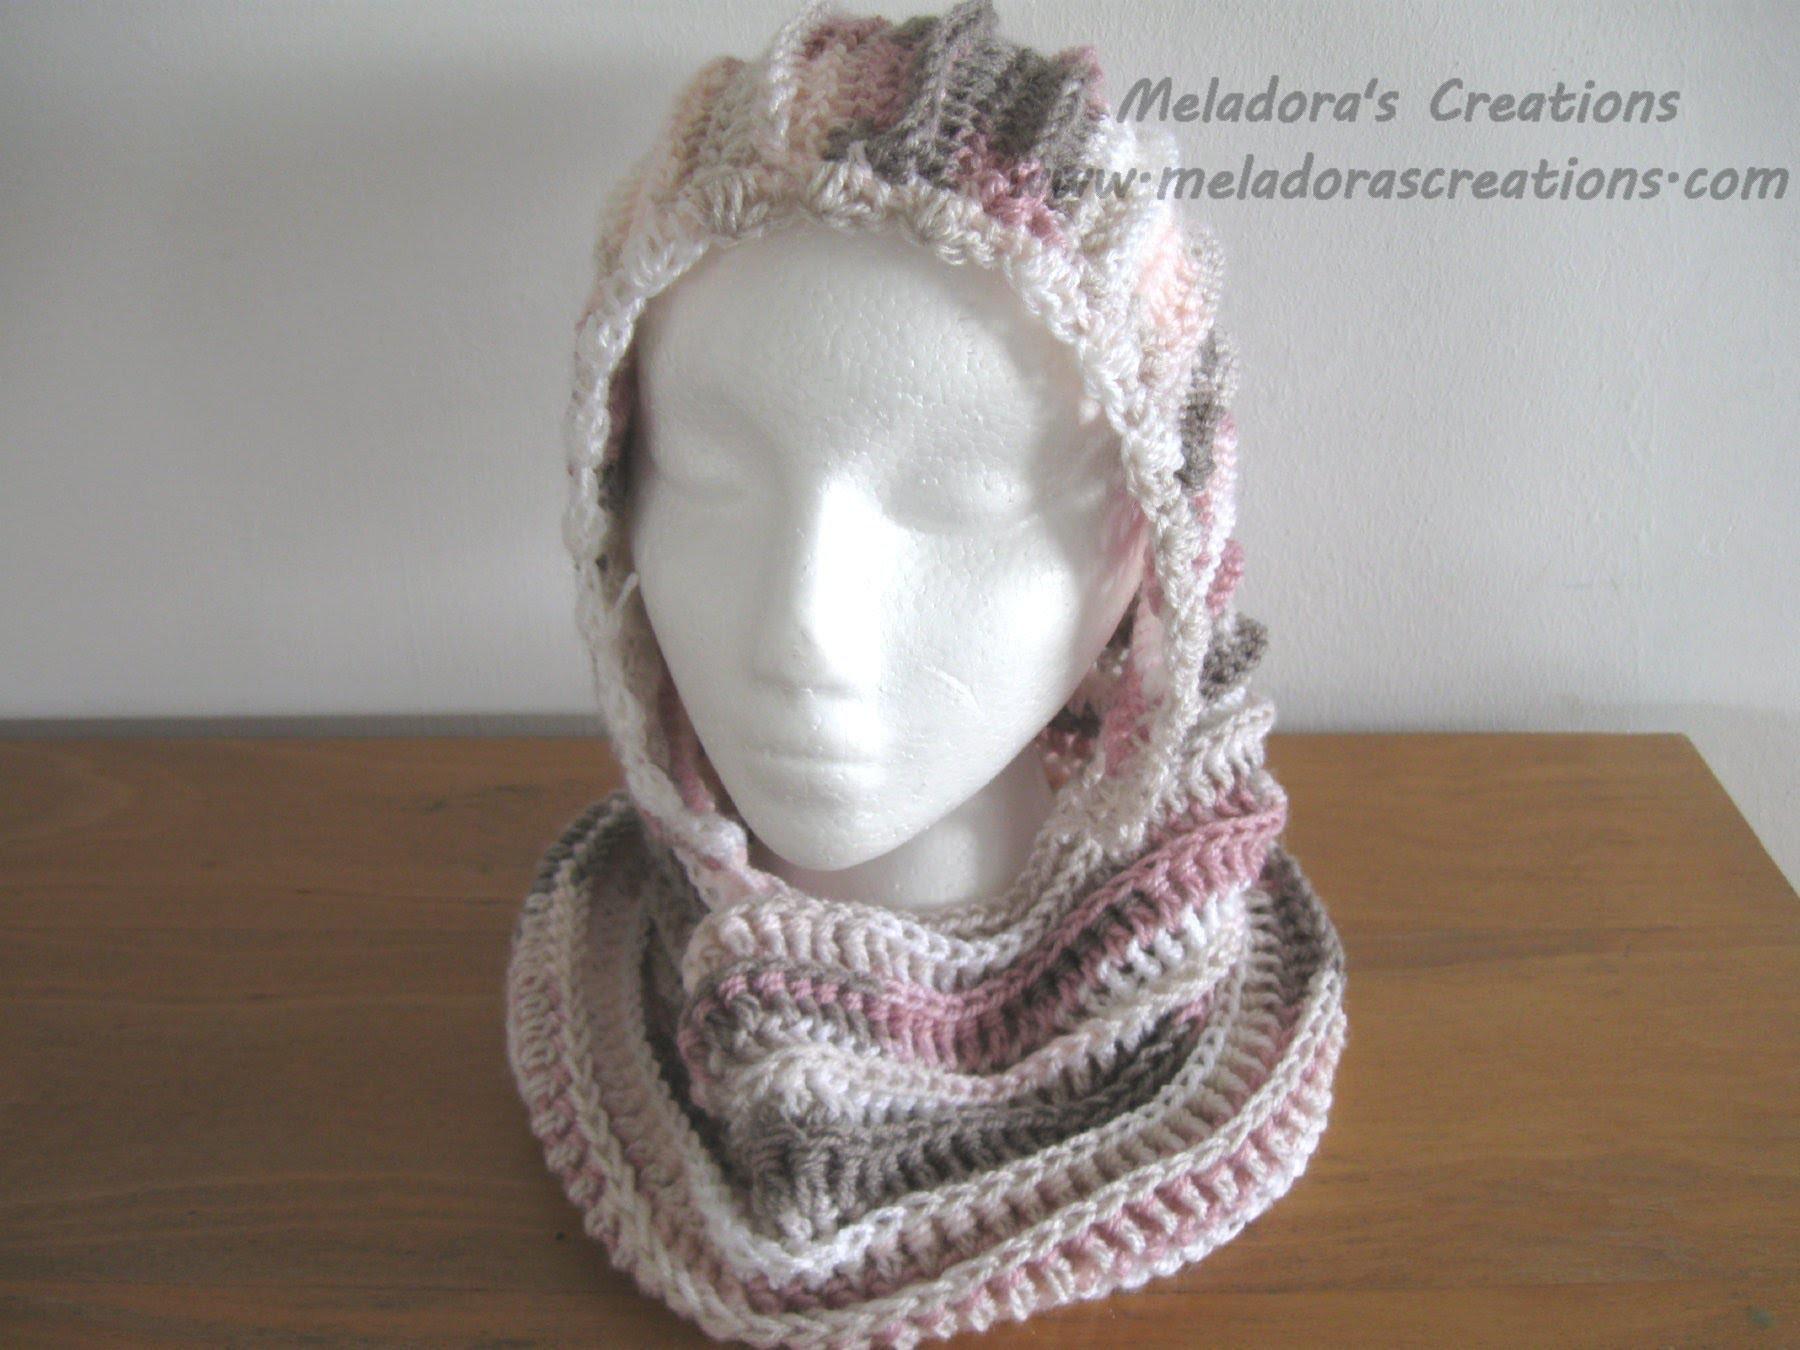 Riptide Hooded Cowl - Crochet Tutorial